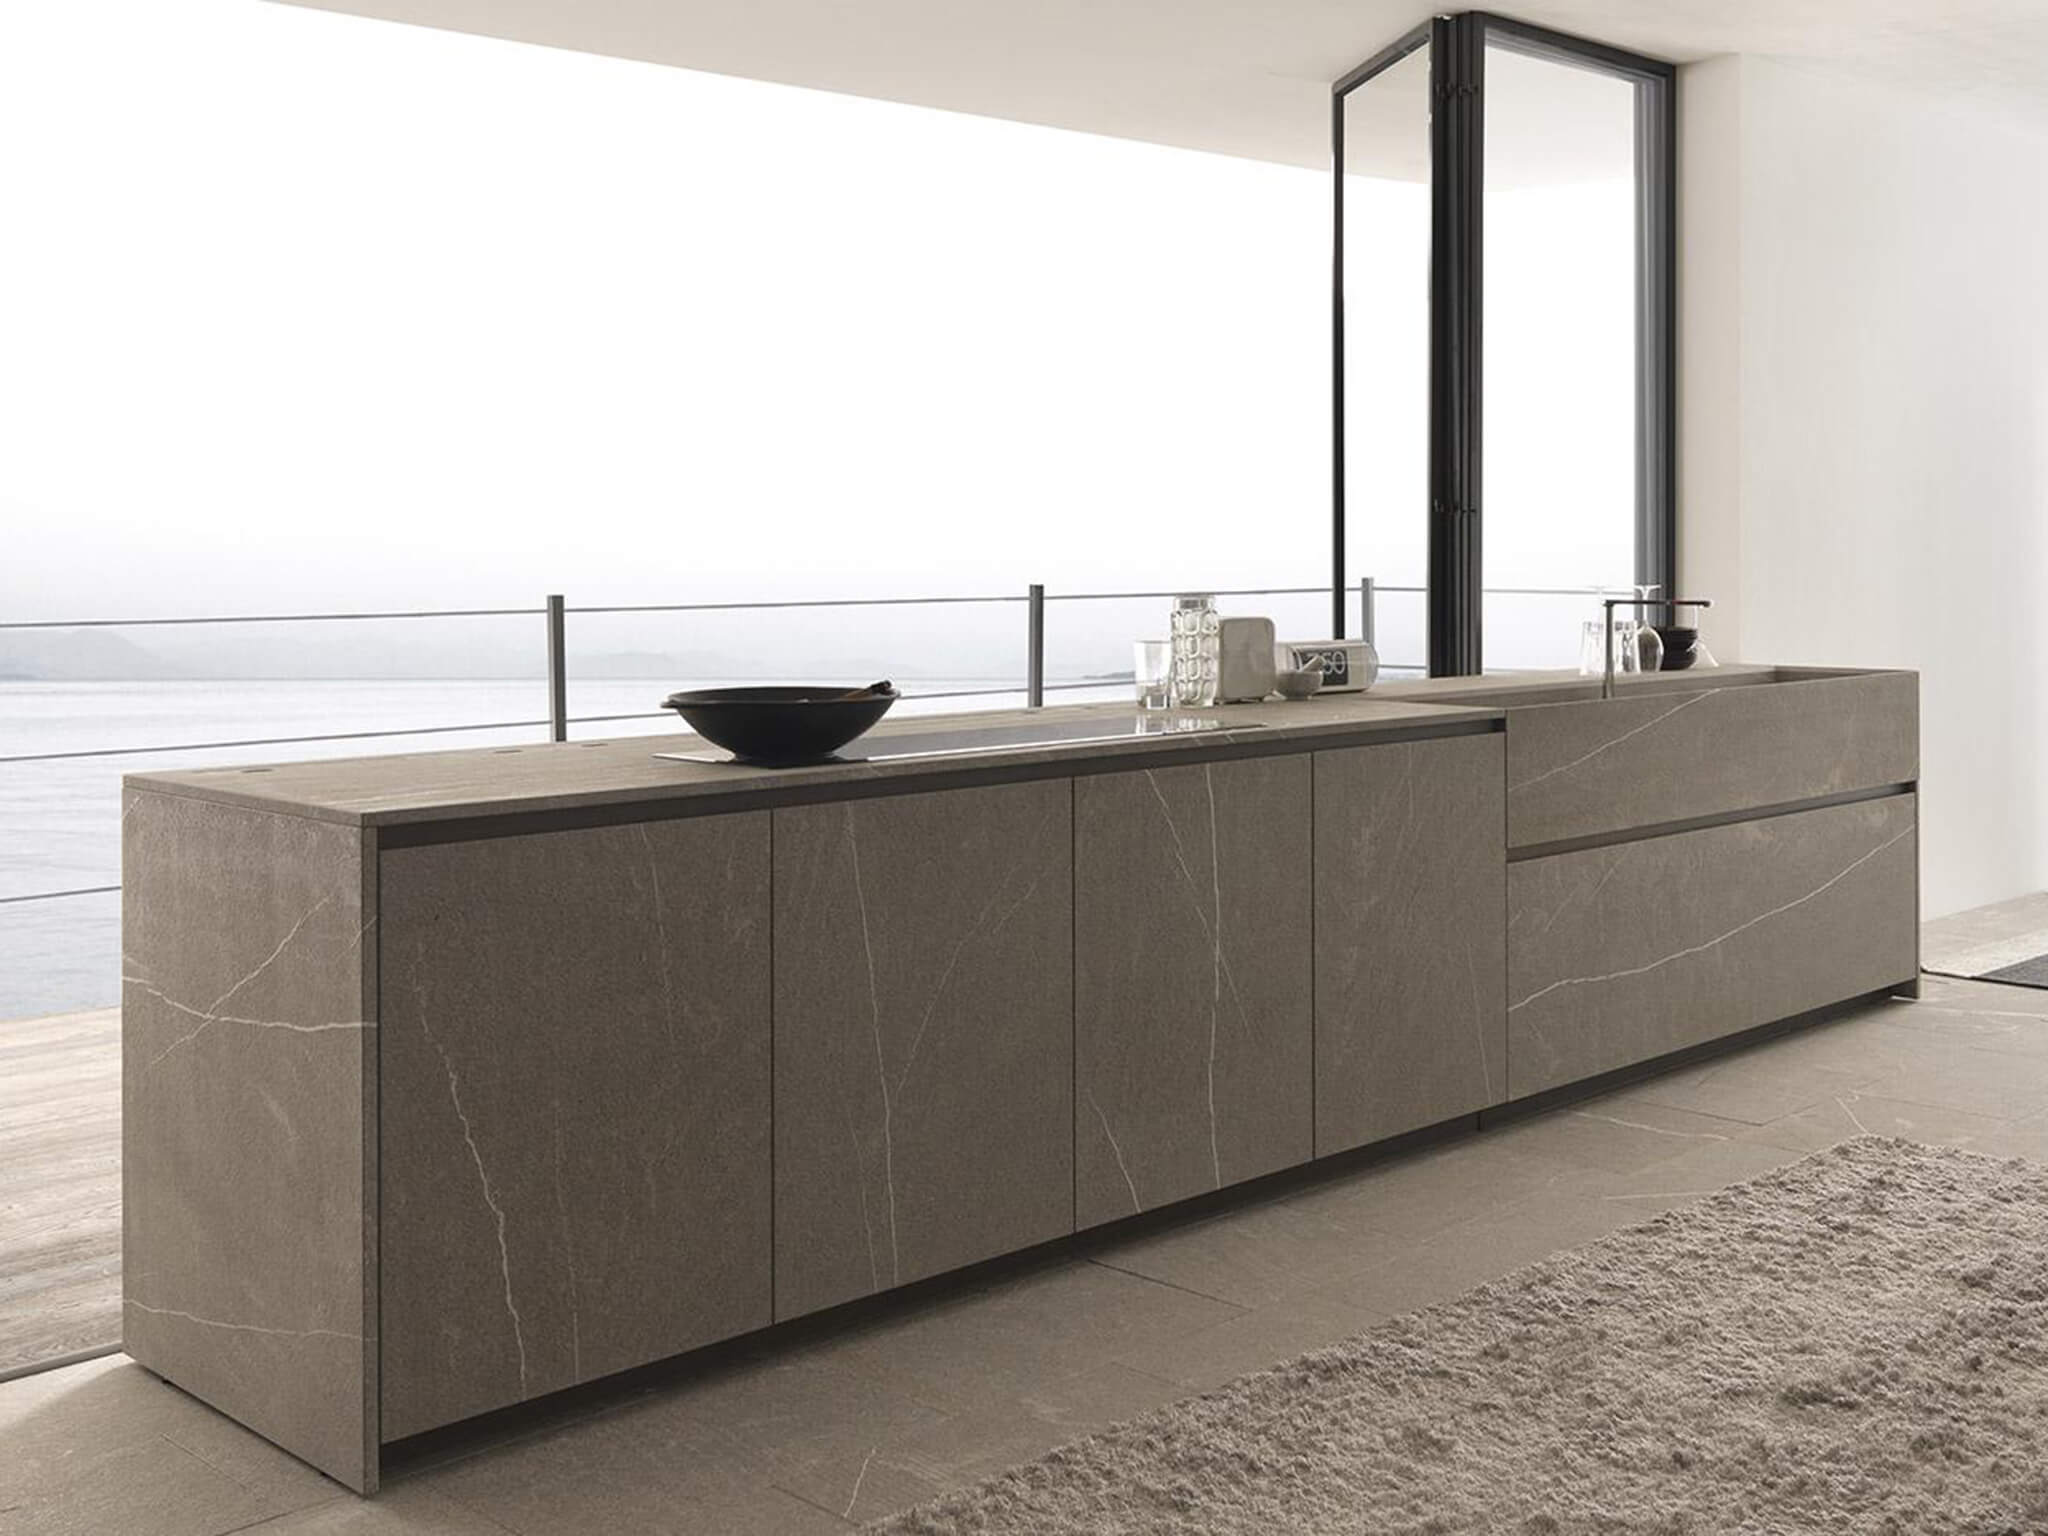 Twenty kitchen cabinetry modulnova archisesto chicago